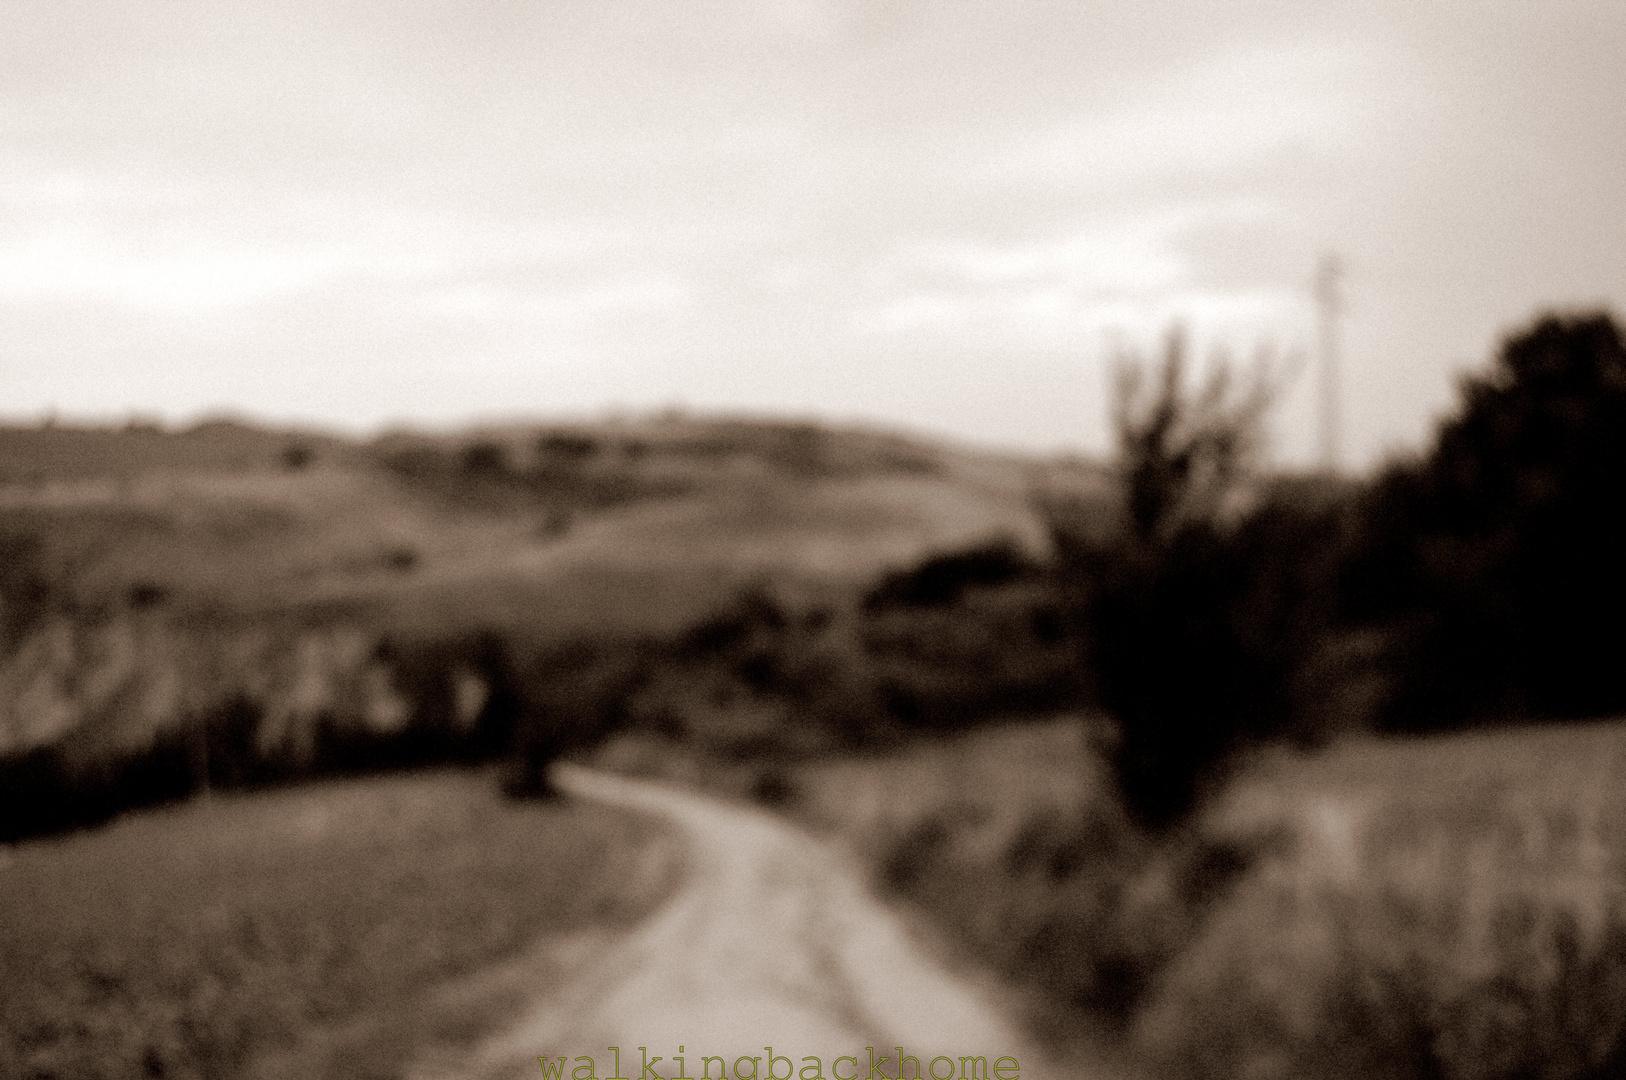 walking back home (photowalking)